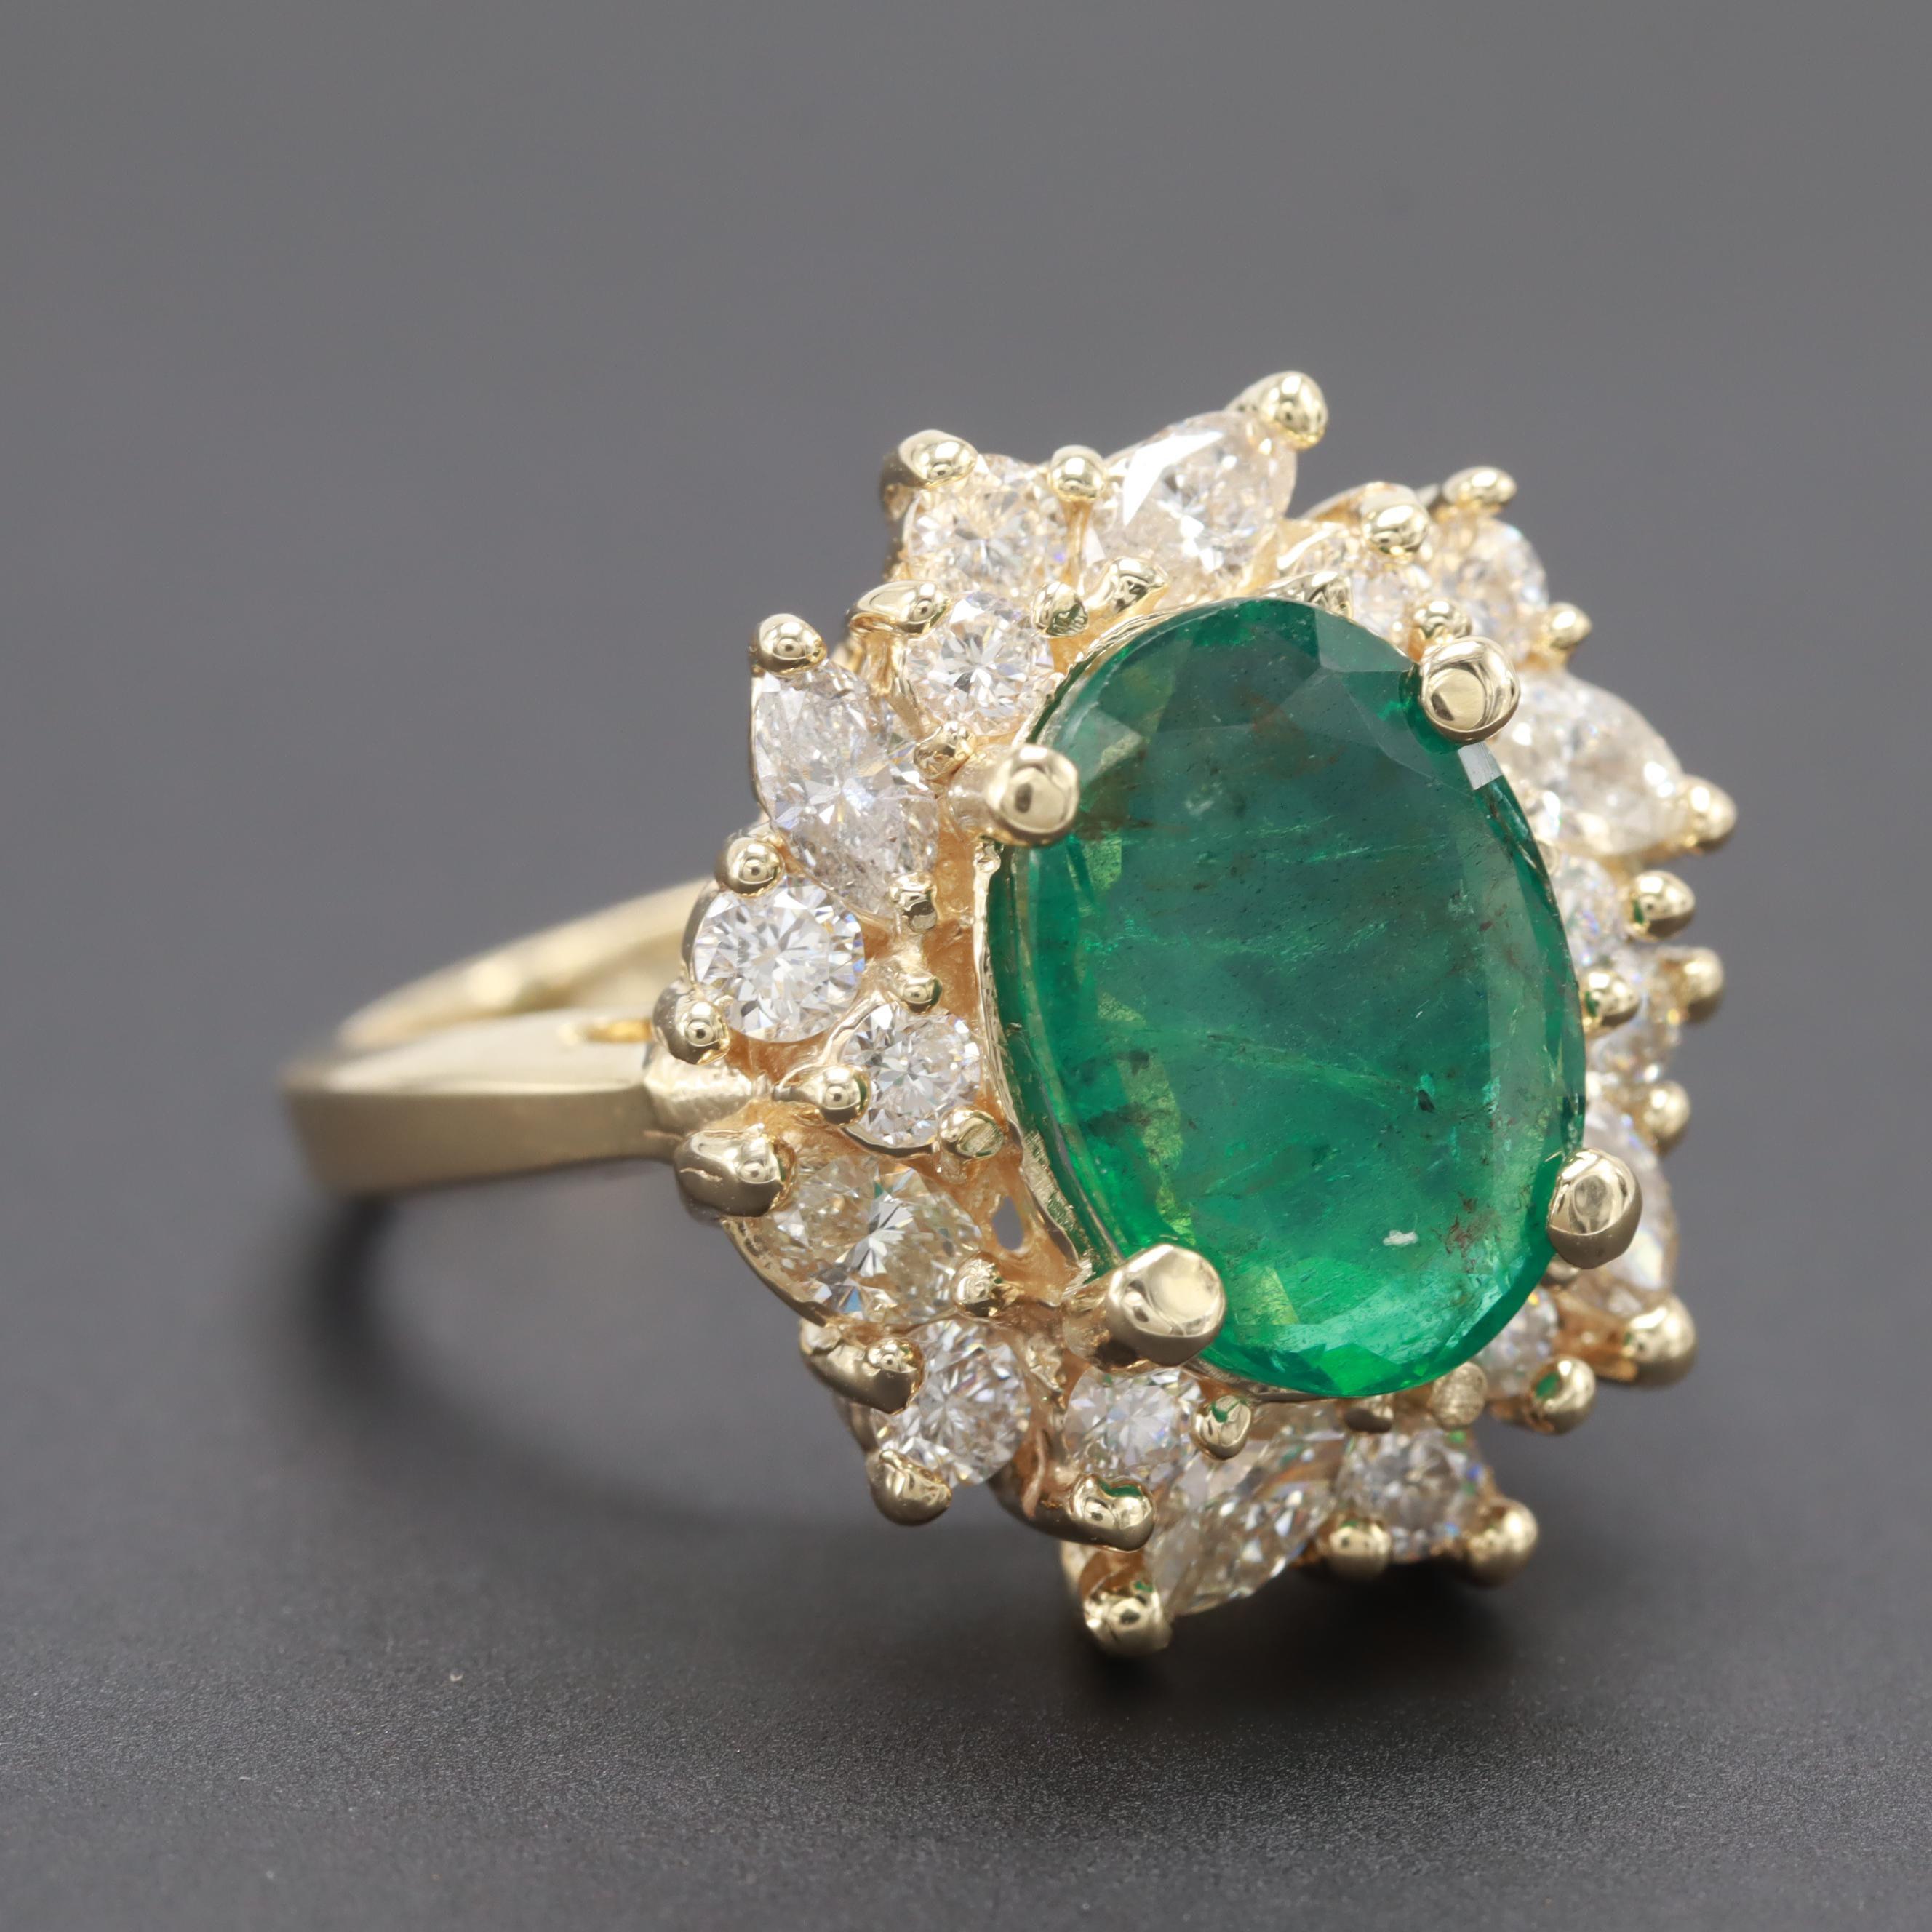 14K Yellow Gold 2.28 CT Emerald and 1.48 CTW Diamond Ring